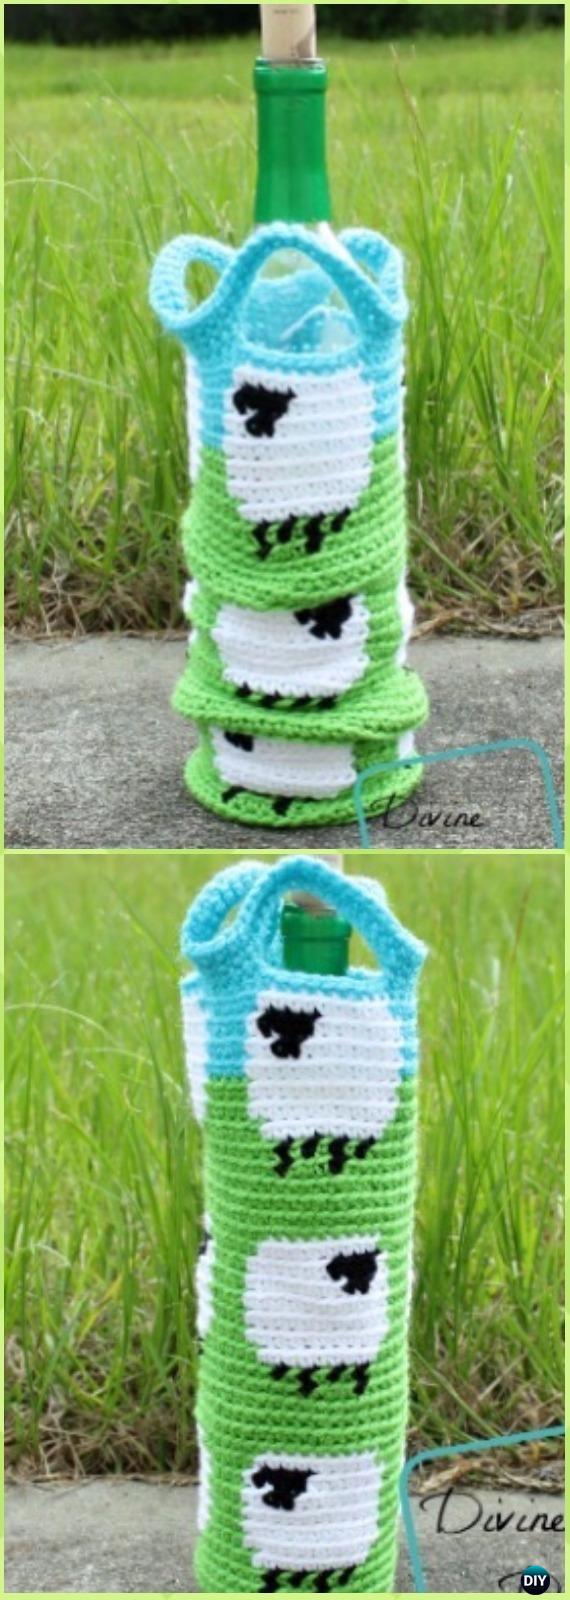 Crochet Wine Bottle Cozy Bag  Sack Free Patterns